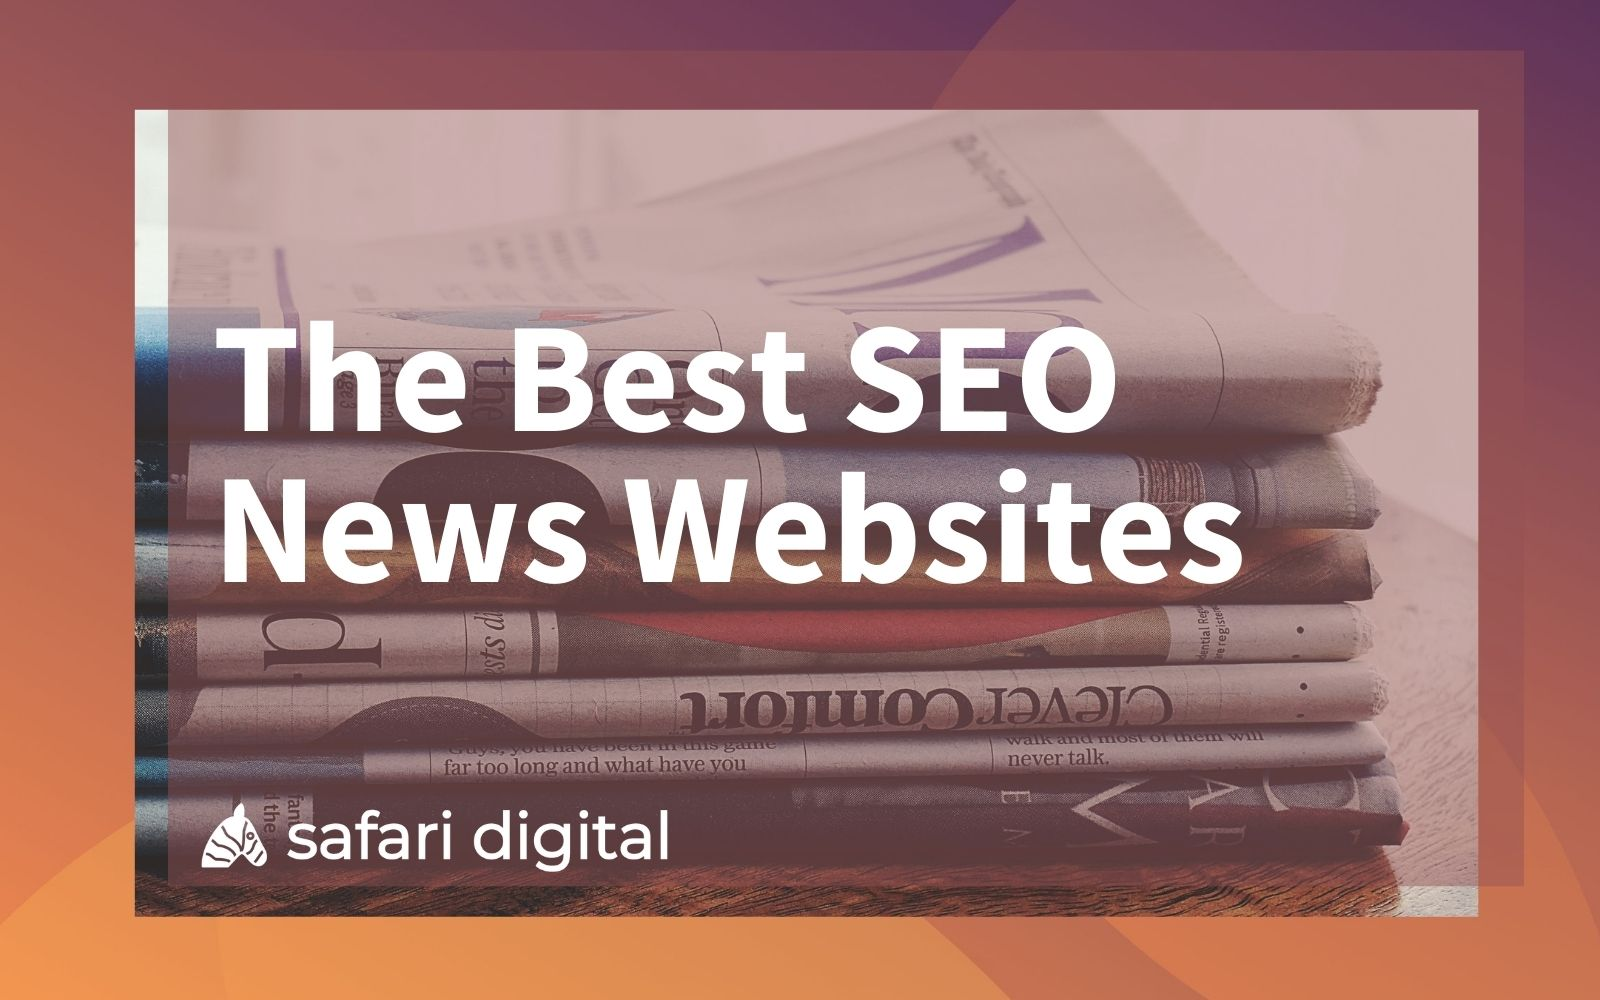 Best SEO news websites cover image